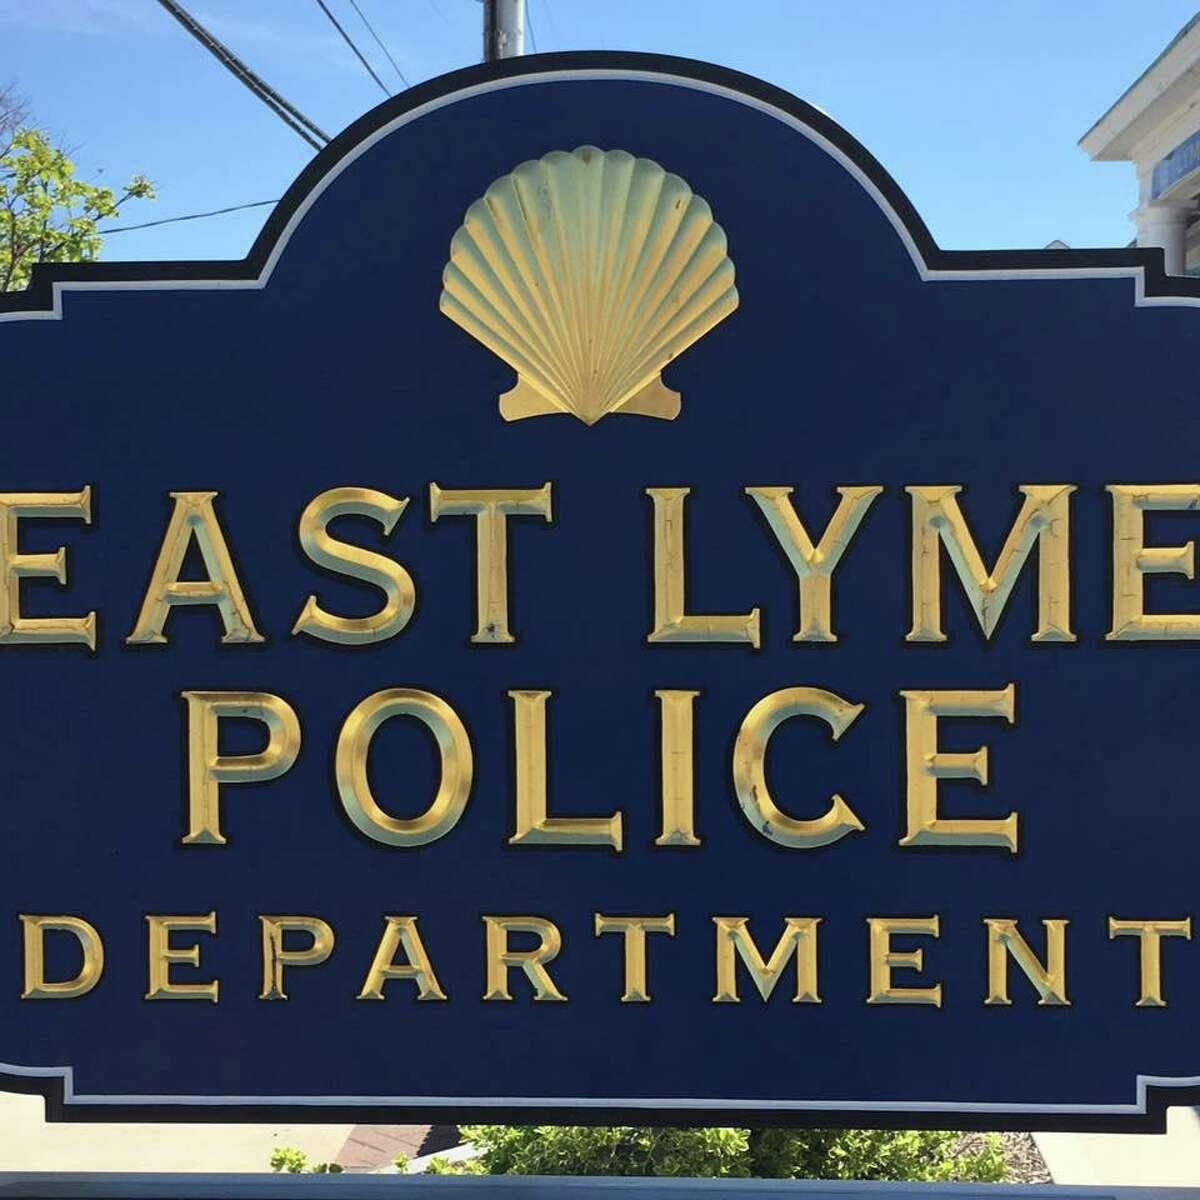 East Lyme police sign